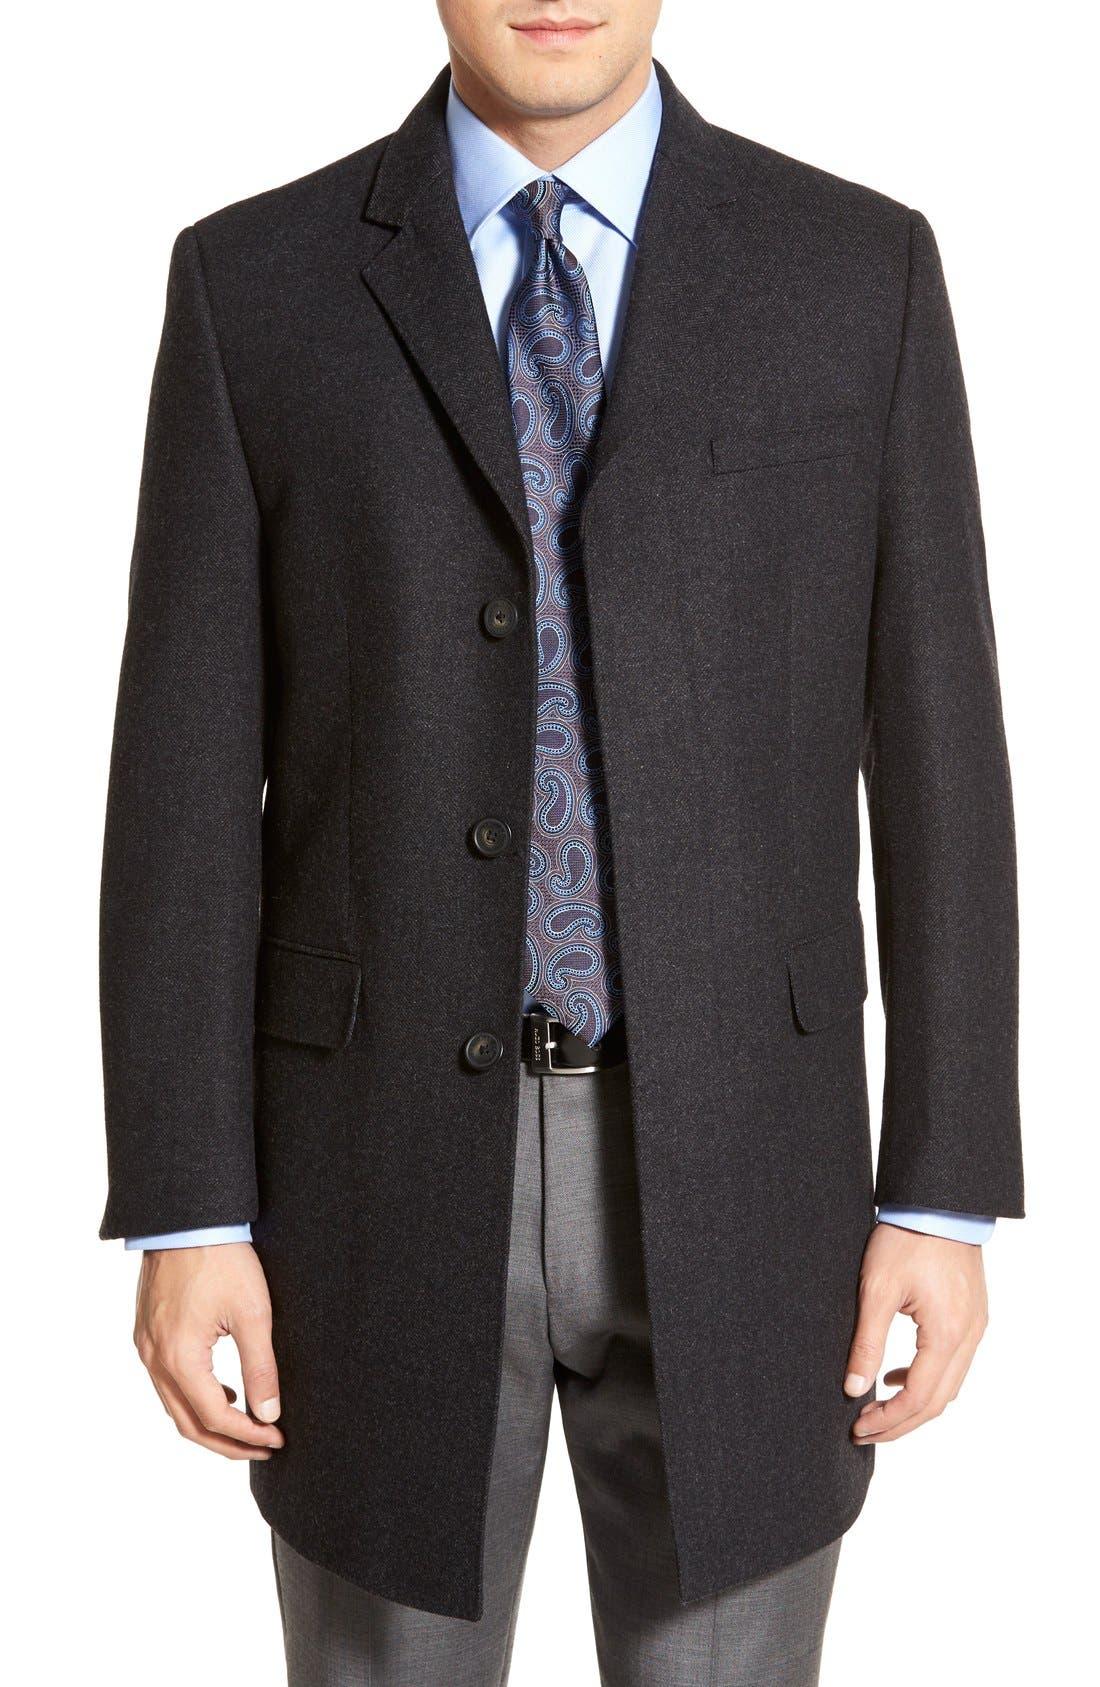 Maitland Modern Fit Wool Blend Overcoat,                         Main,                         color, 035